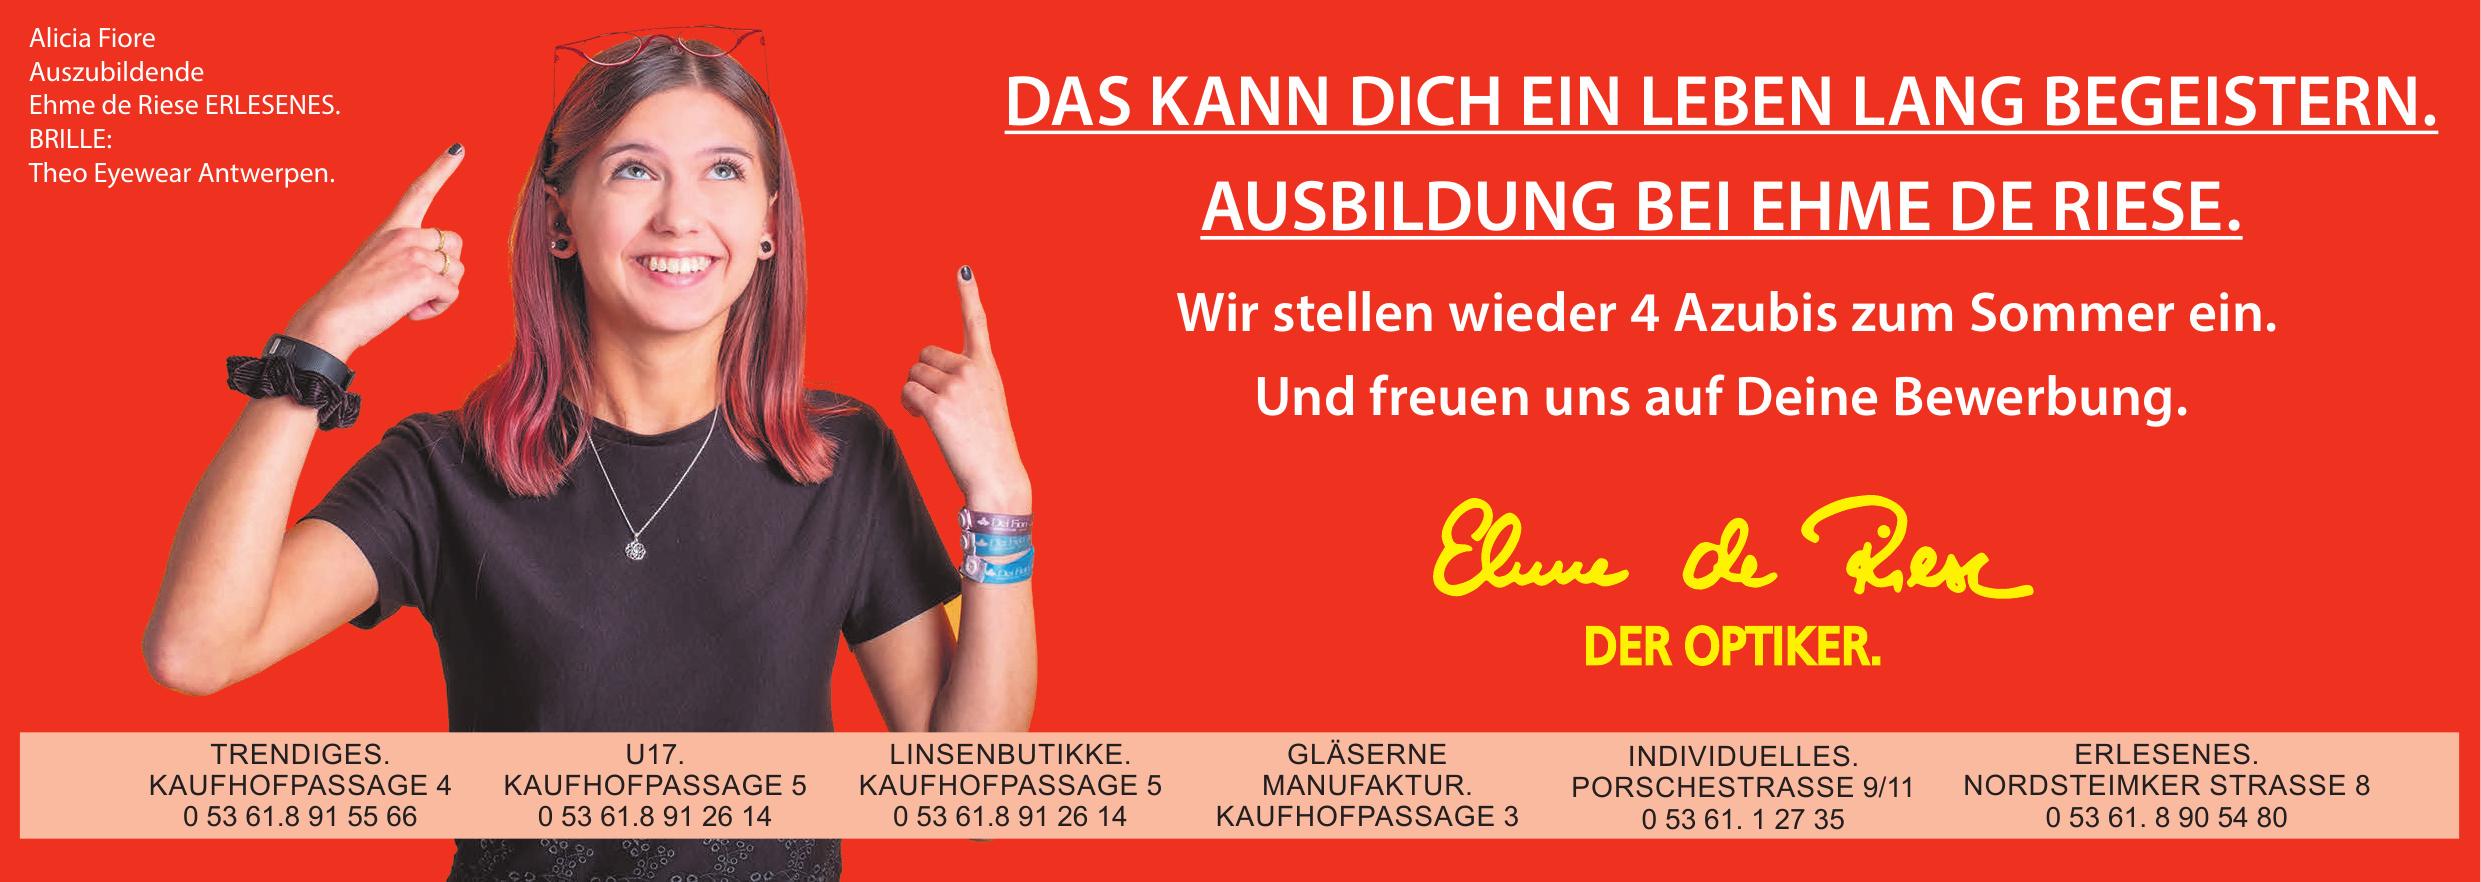 Ehme de Riese U17.